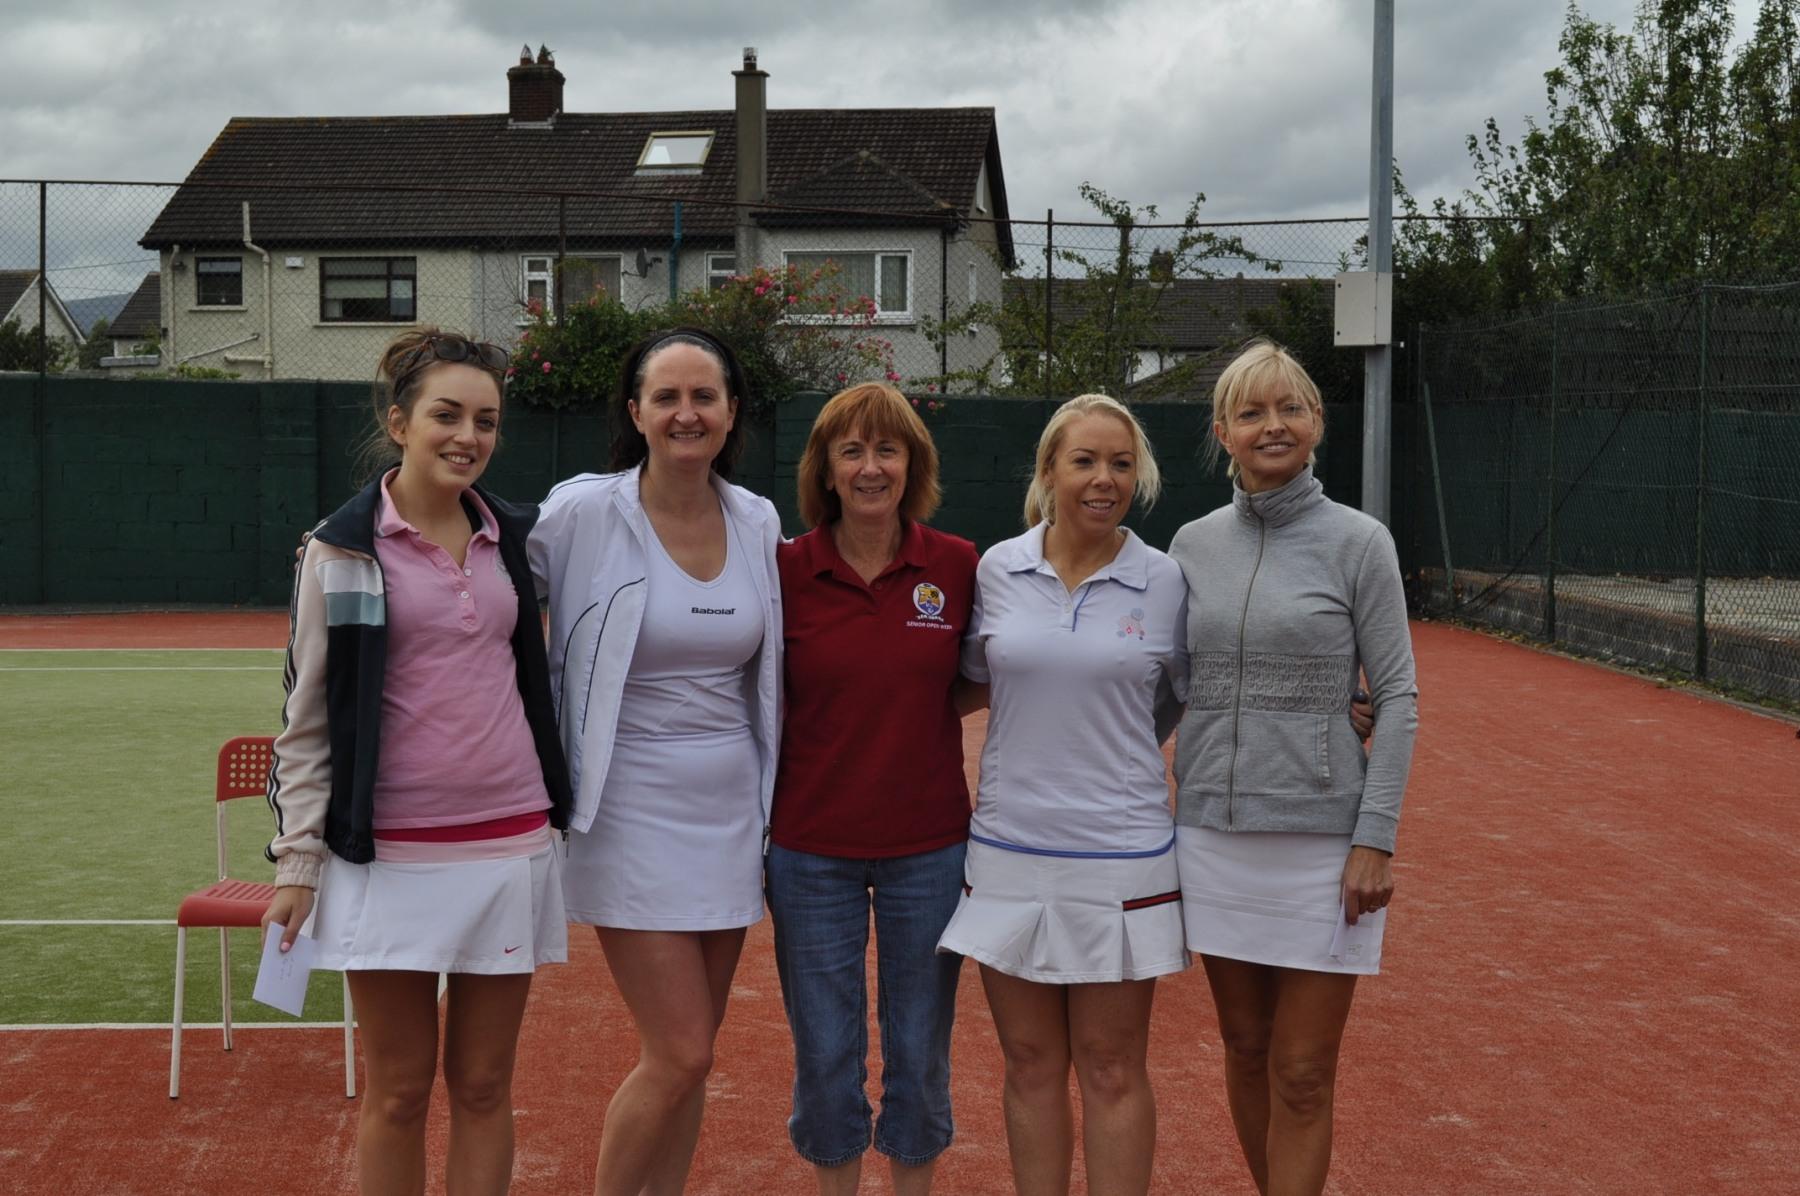 Ladies-Doubles-Class-2-3-Finalists-Emma-Lendrum-Ailish-Byrne-Grace-Mary-Fitzsimons-Jean-Baker